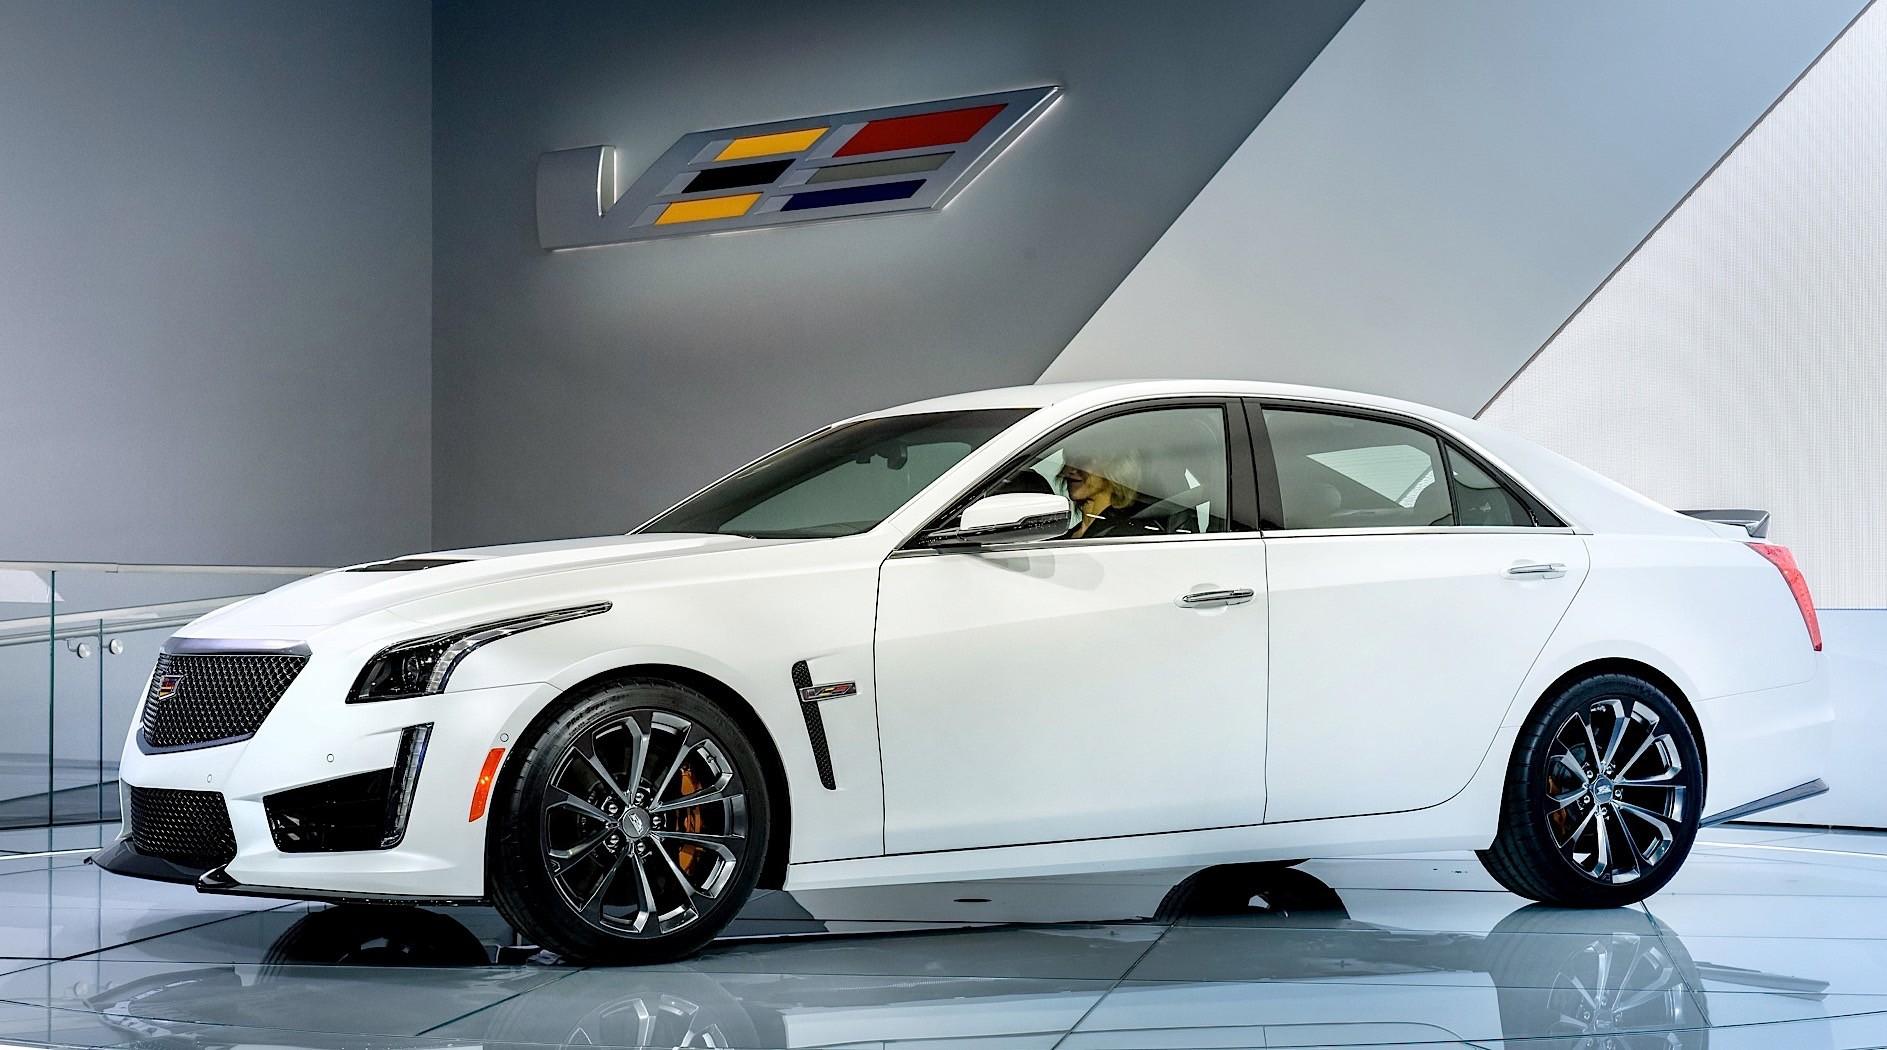 2017 Cadillac Cts V Review Autoevolution